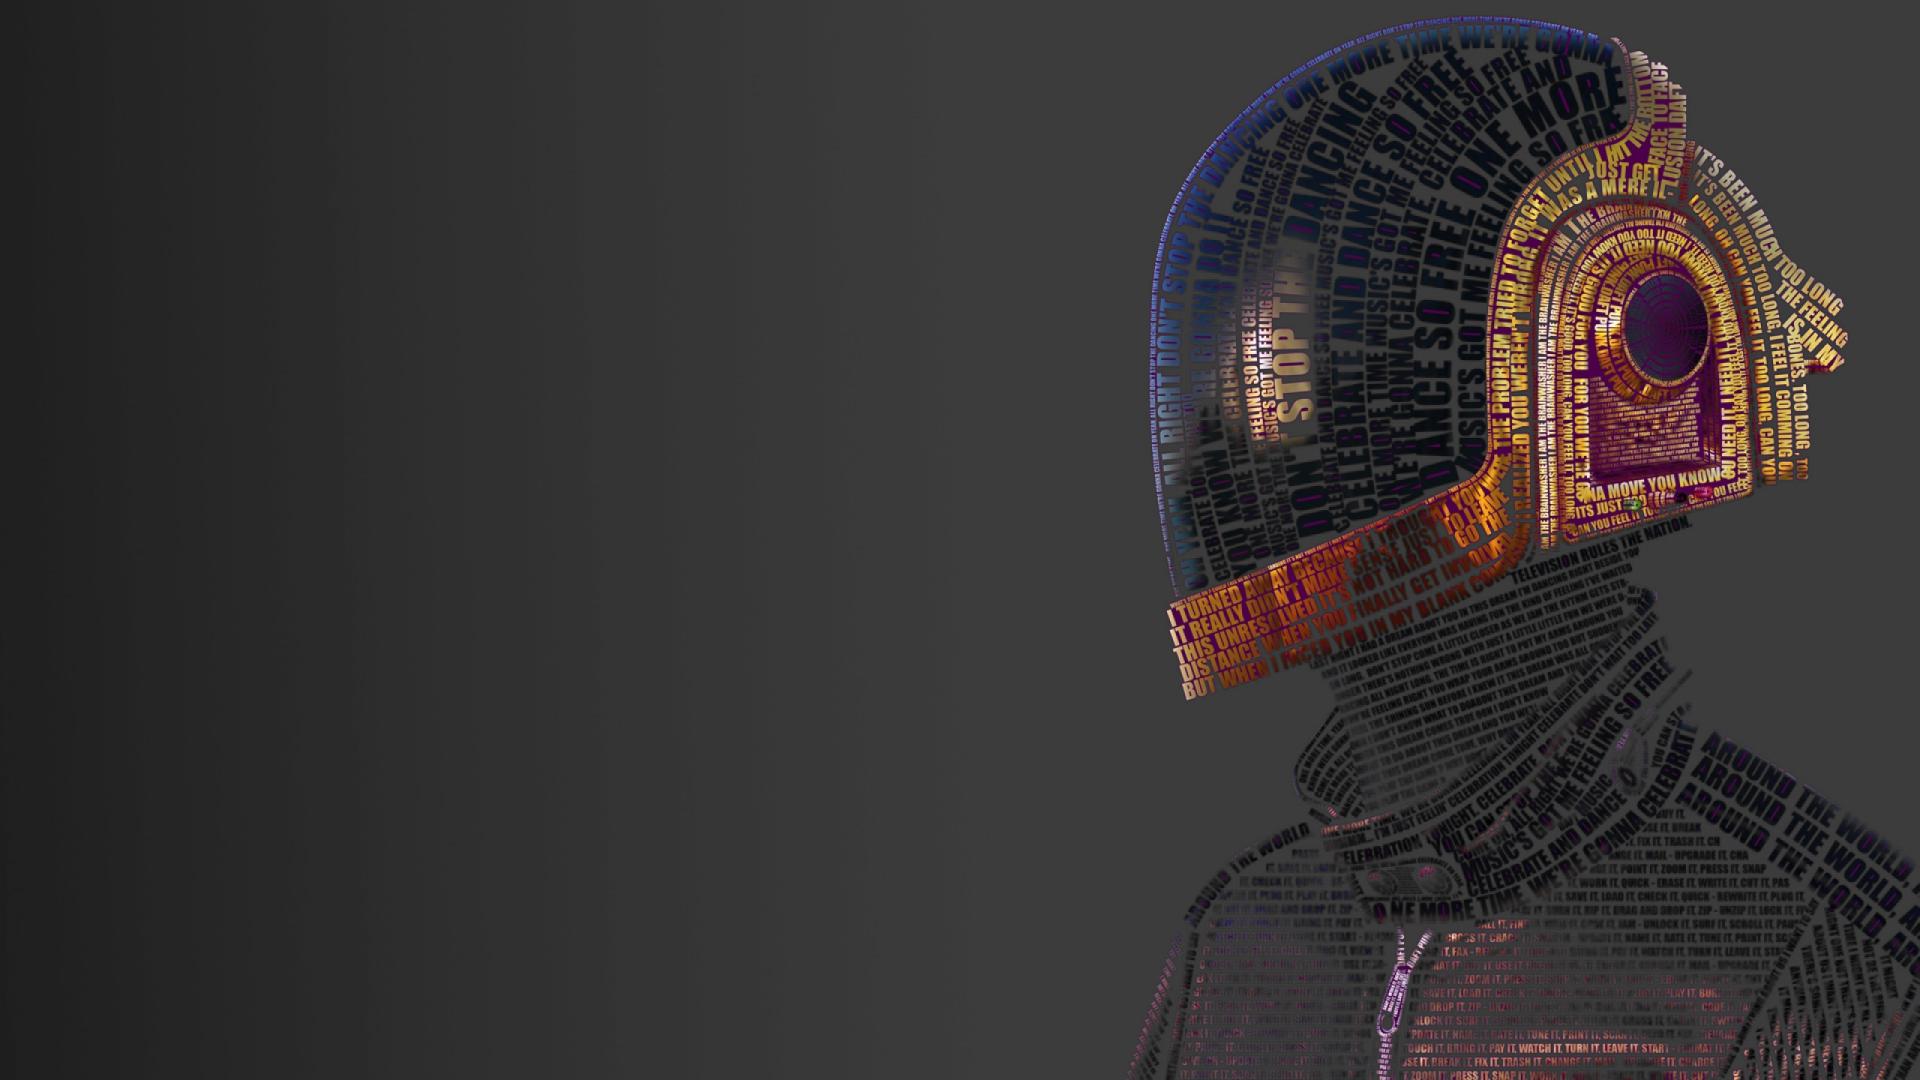 Daft Punk HD Wallpaper | Background Image | 2560x1440 | ID ...